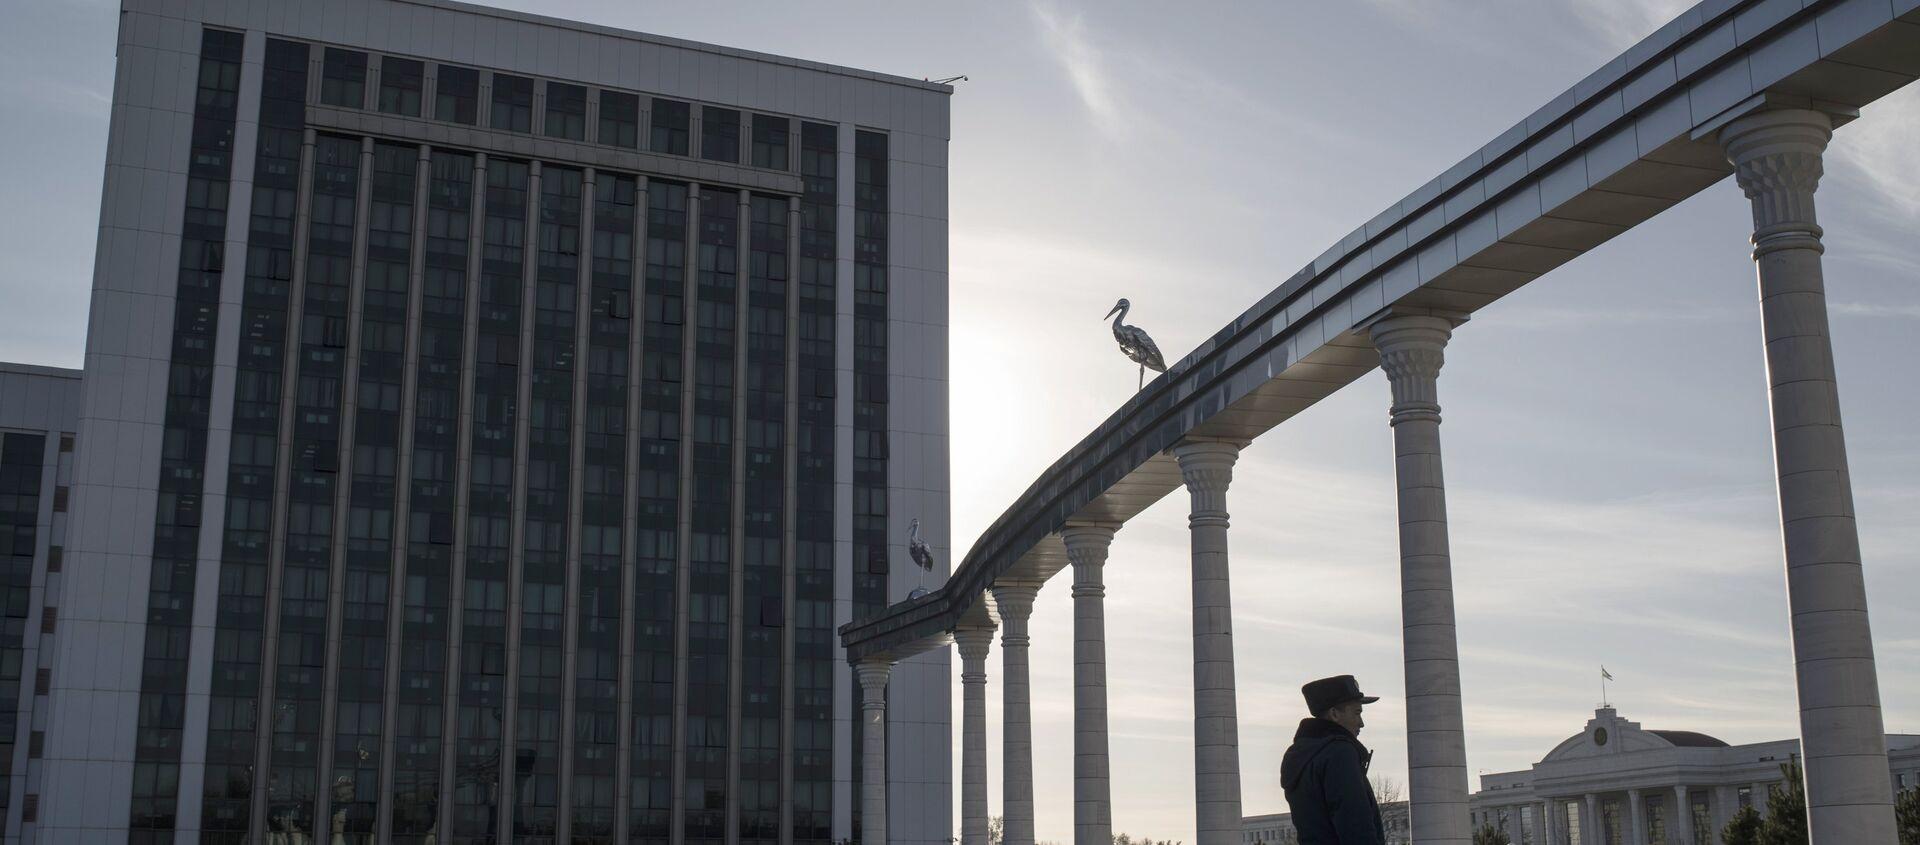 Здание Министерства финансов Узбекистана в Ташкенте - Sputnik Узбекистан, 1920, 22.05.2019